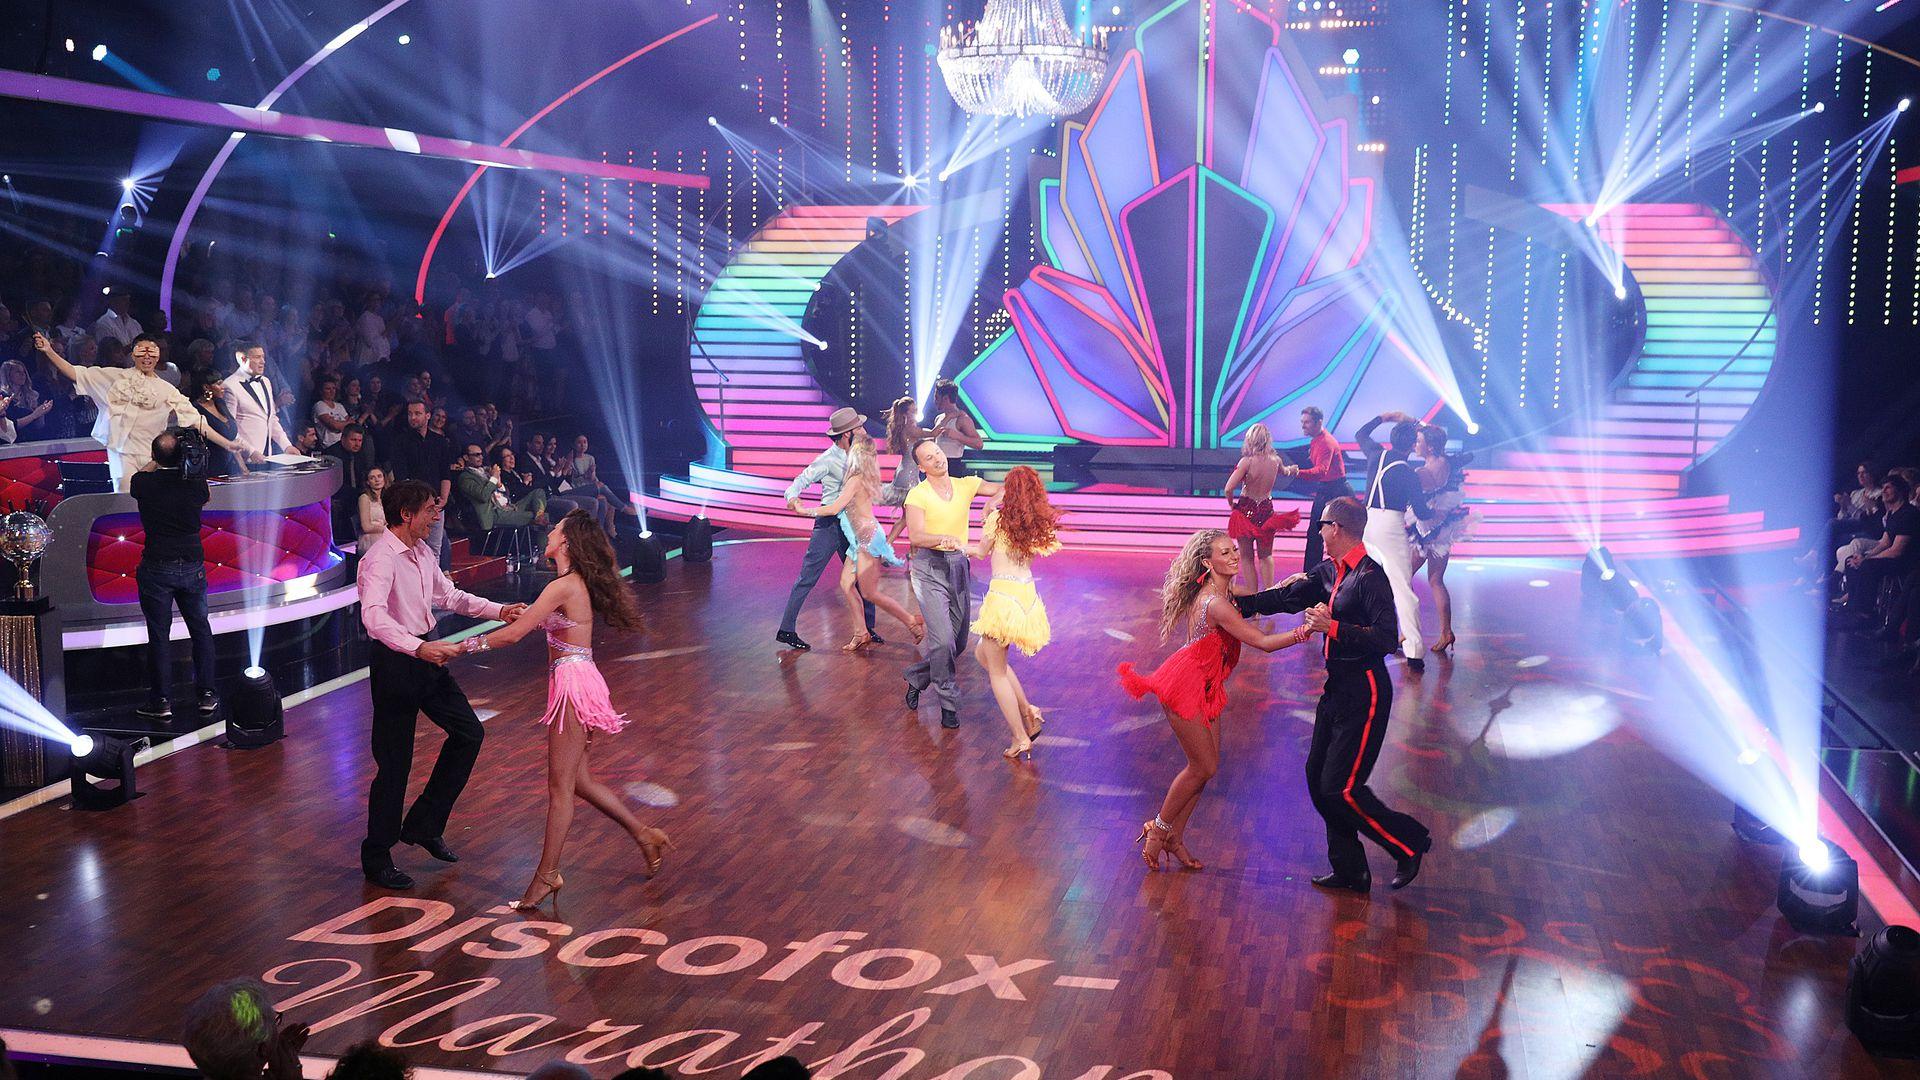 LetS Dance Discofox Marathon